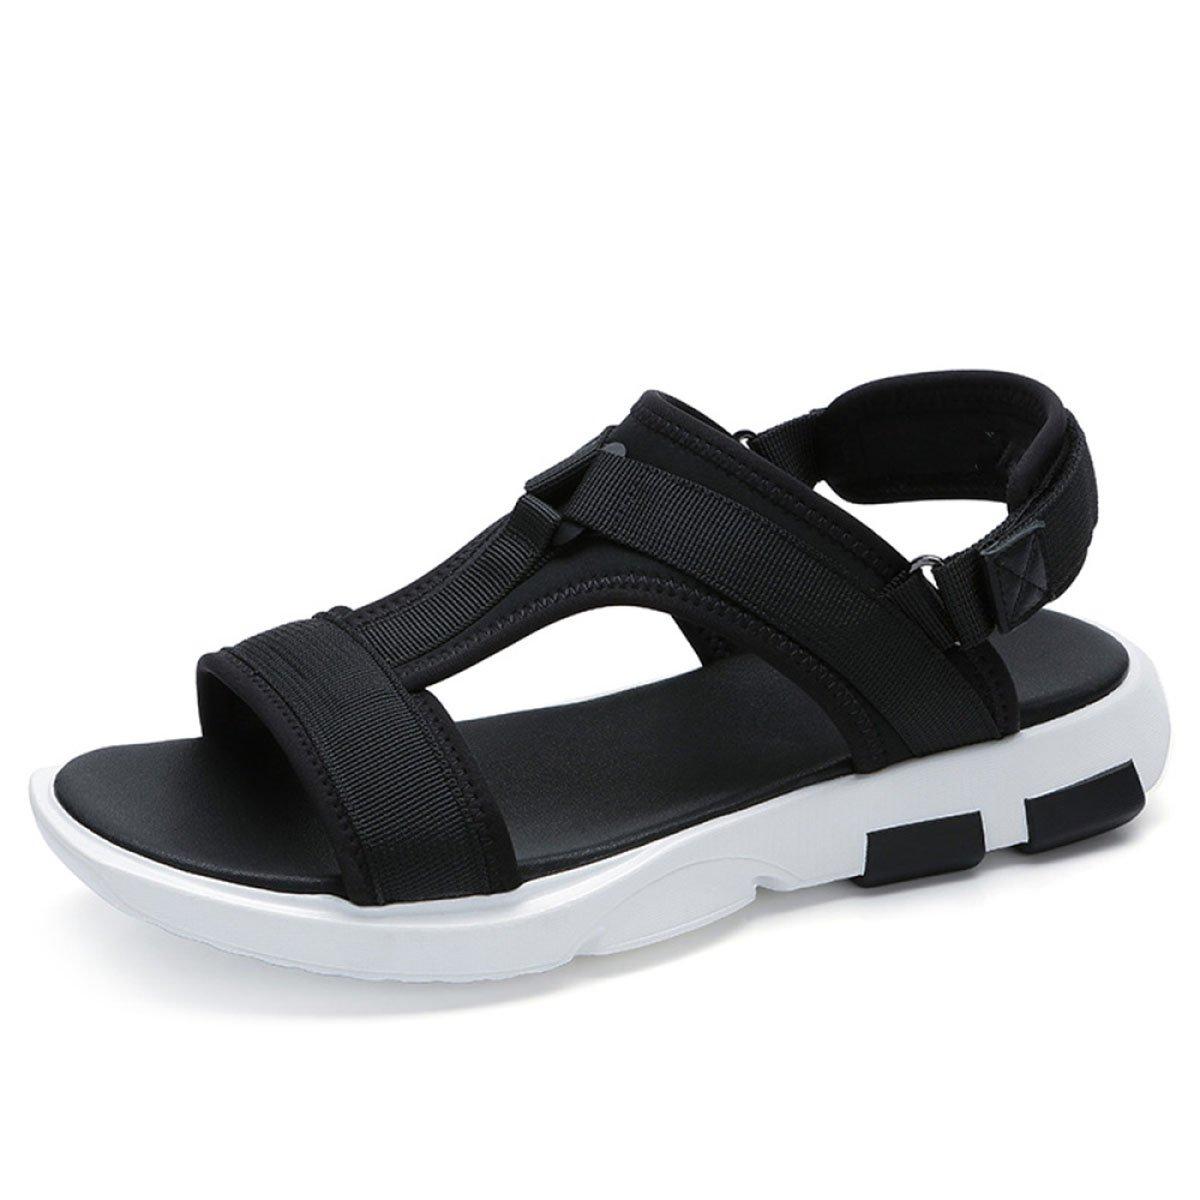 Koyi Herrenschuhe Sommermode Atmungsaktive Sandalen schwarz Freizeit Urlaub Rutschfeste JugendSandale schwarz Sandalen 1a4d90